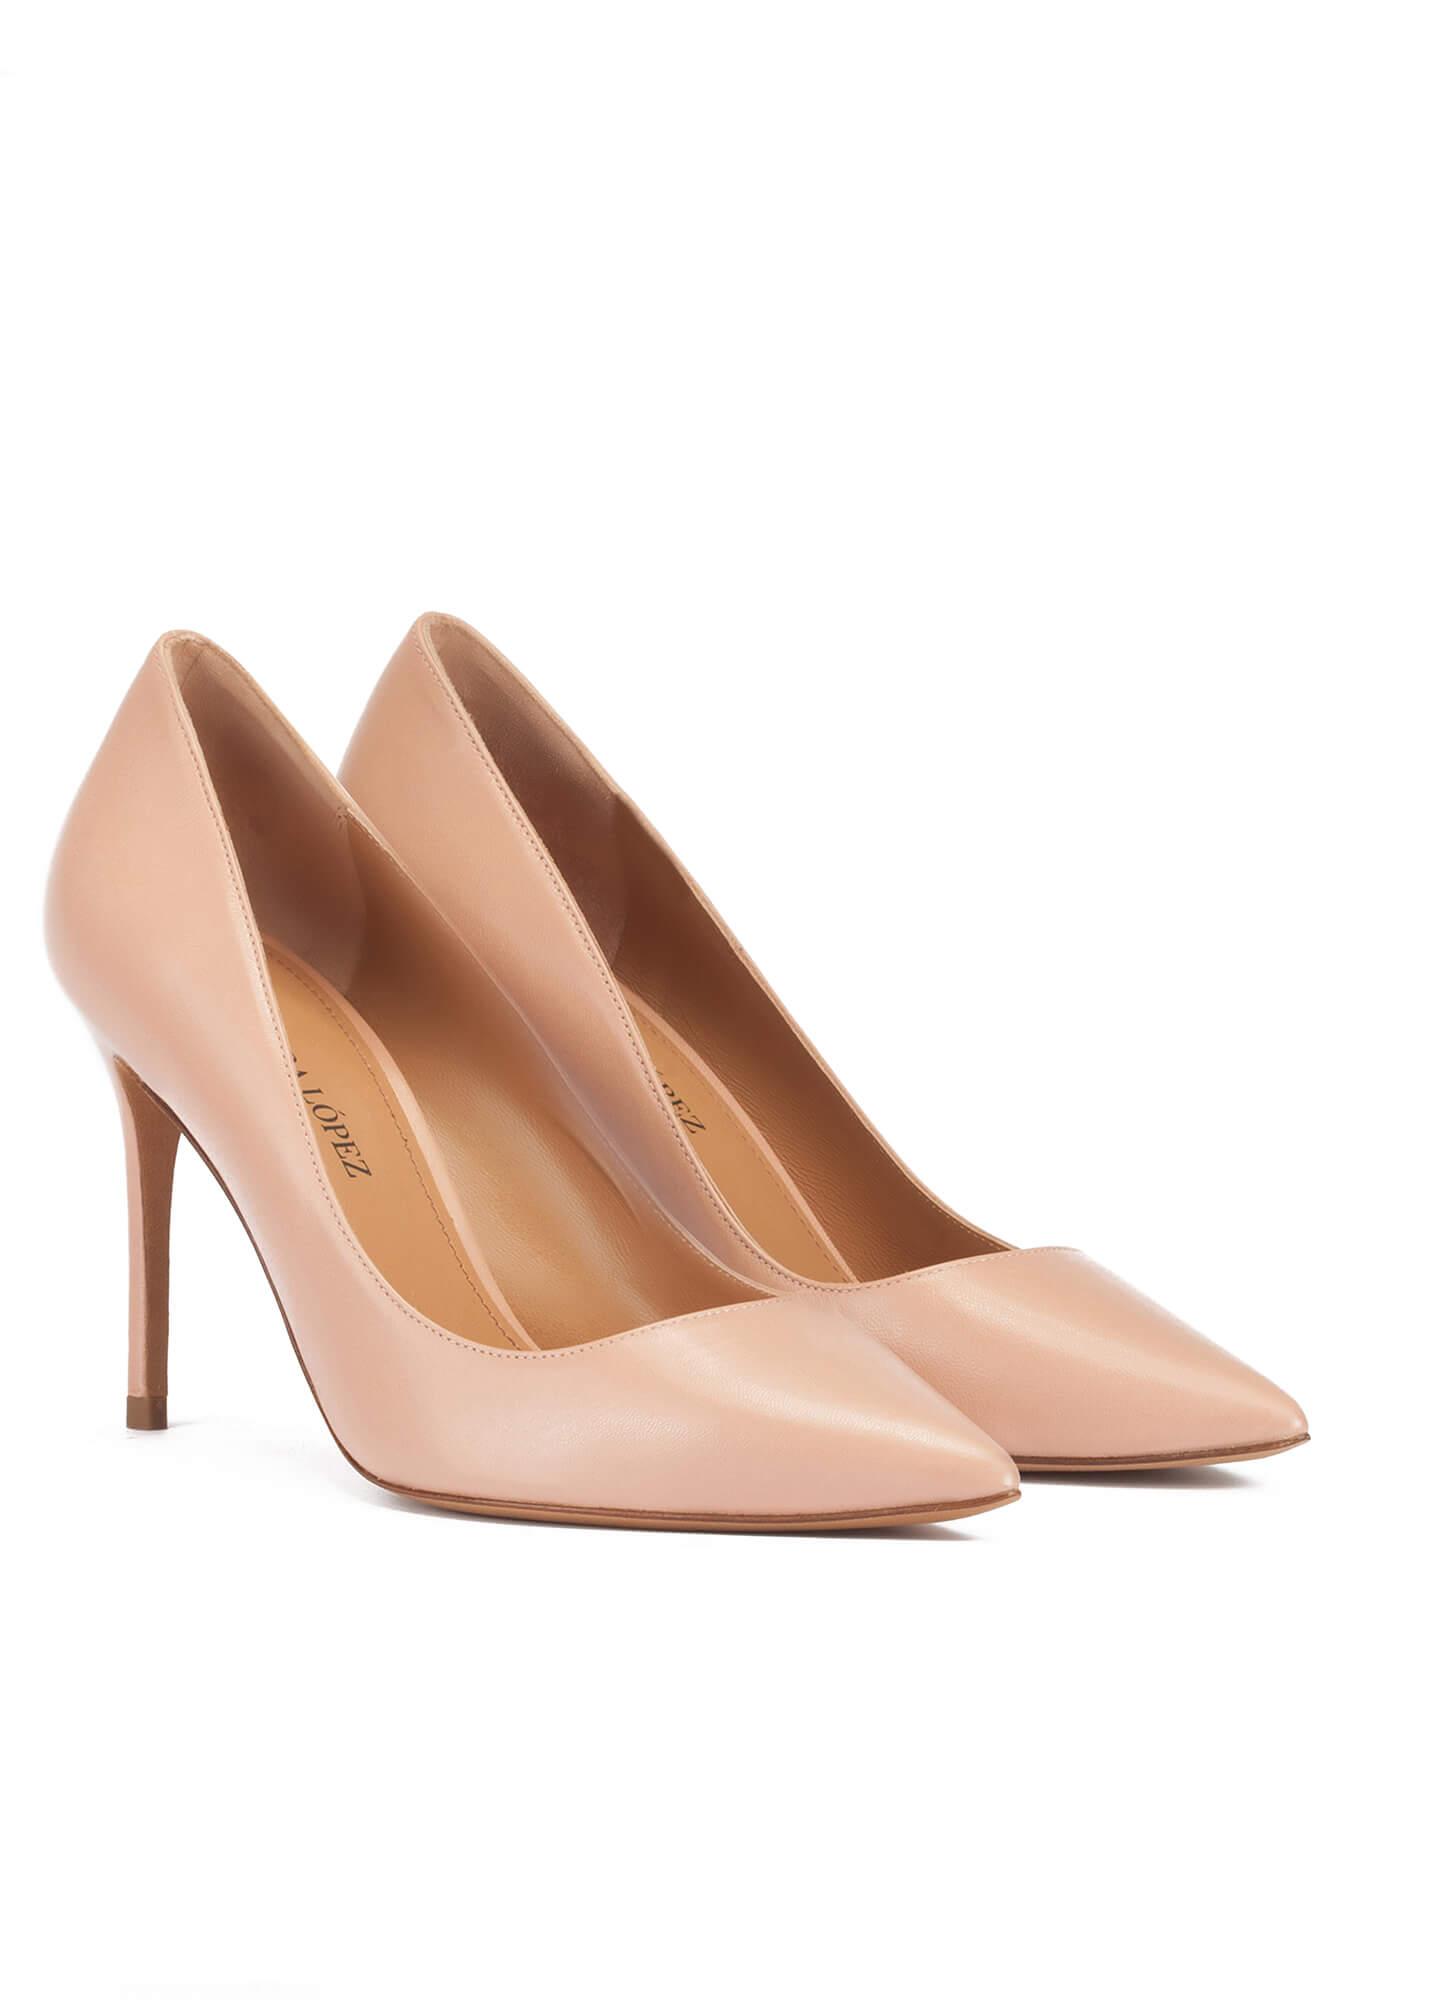 809f4133a7ce Point-toe high heel pumps in nude leather. Olga Pura López